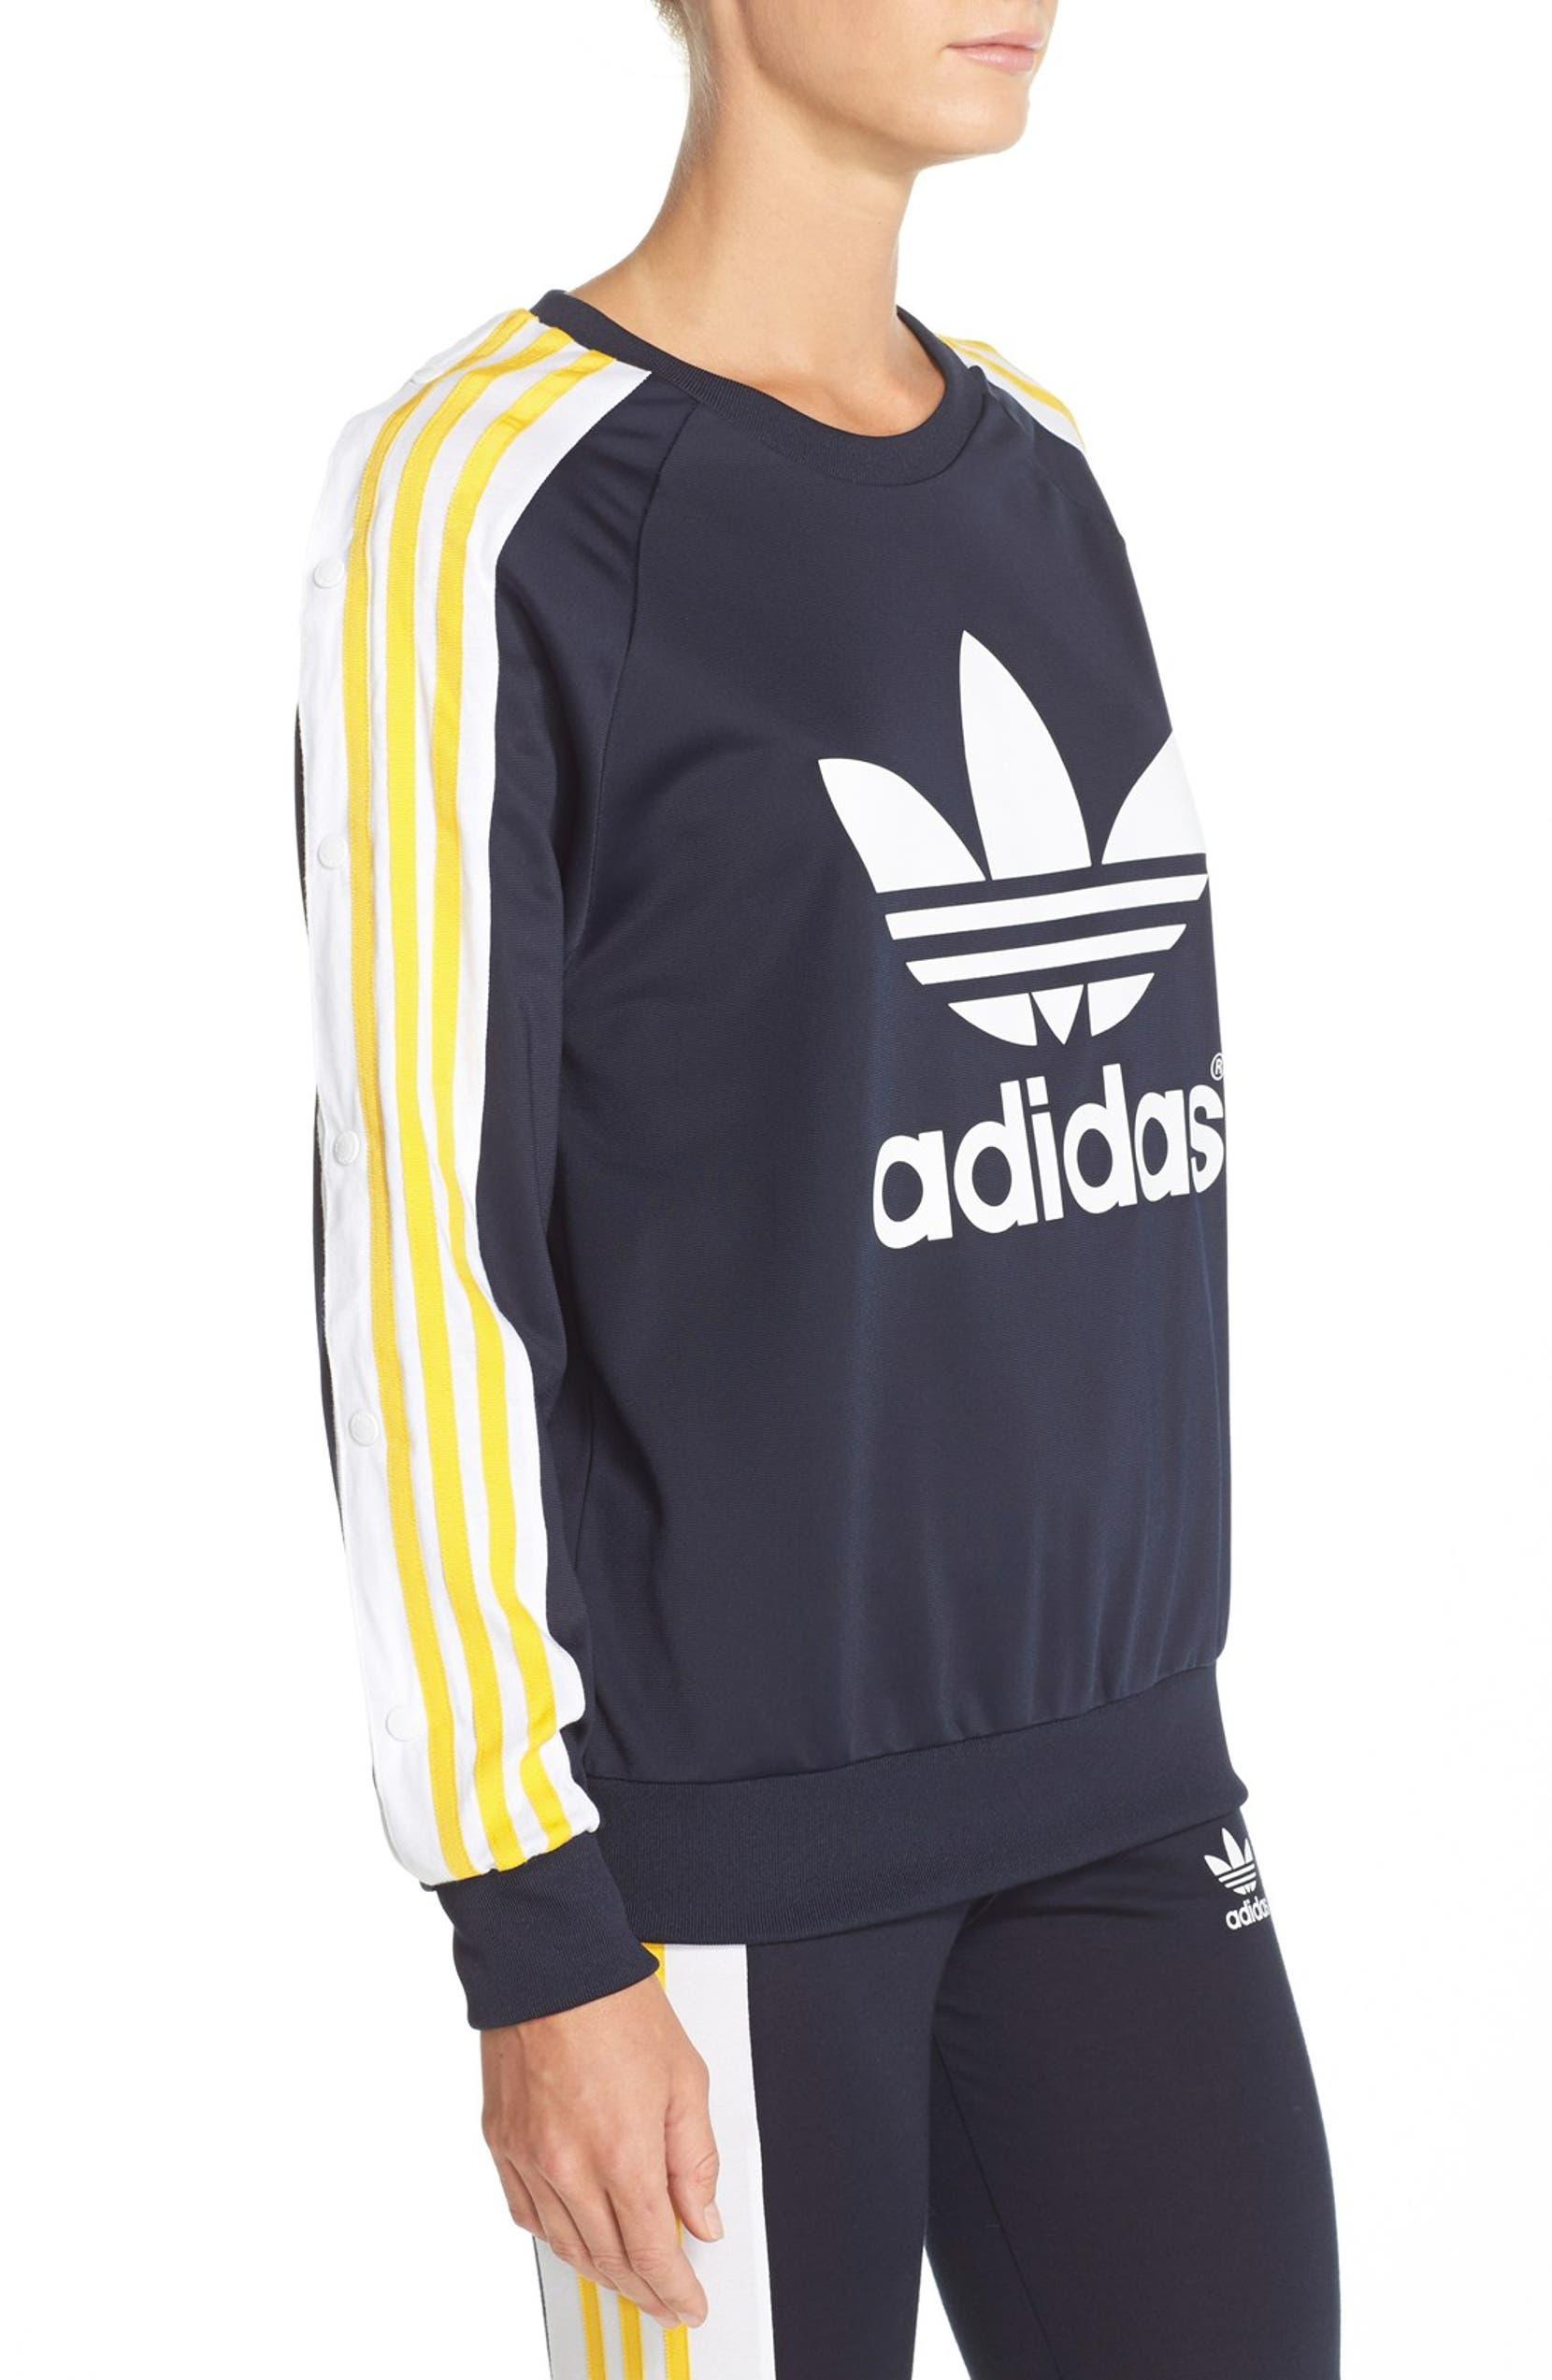 adidas Originals Cosmic Confession Sweatshirt | Nordstrom